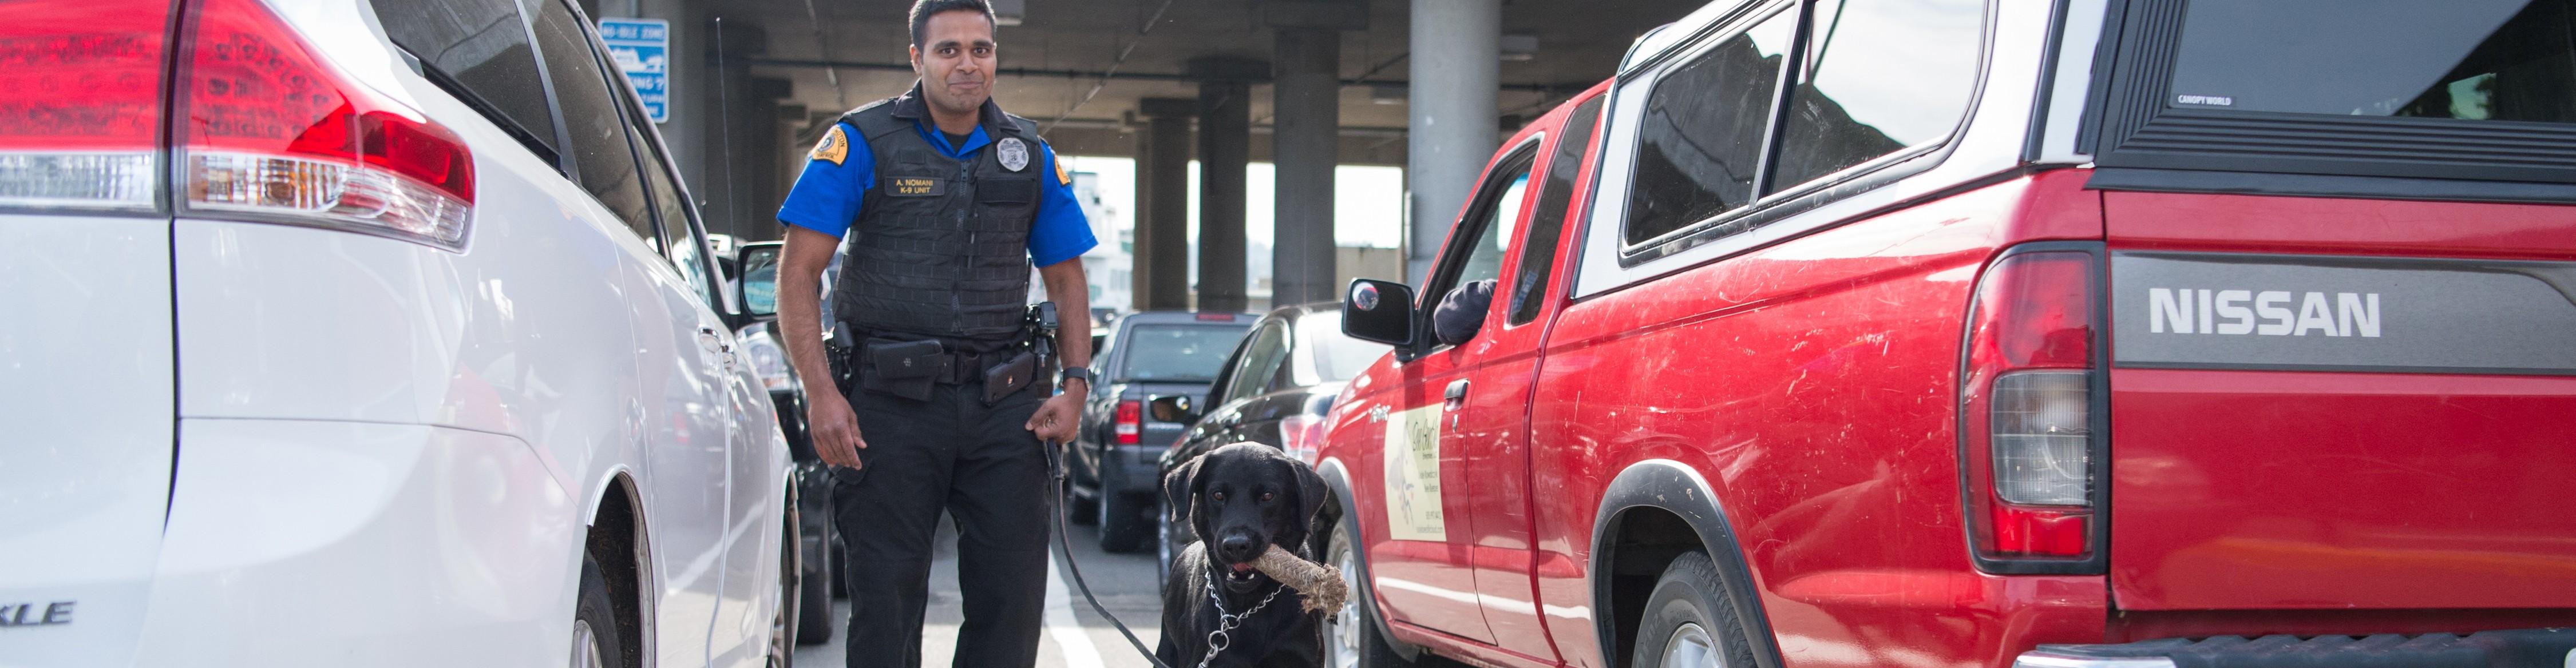 be a trooper wsp rh wsp wa gov Florida State Trooper Colorado State Trooper